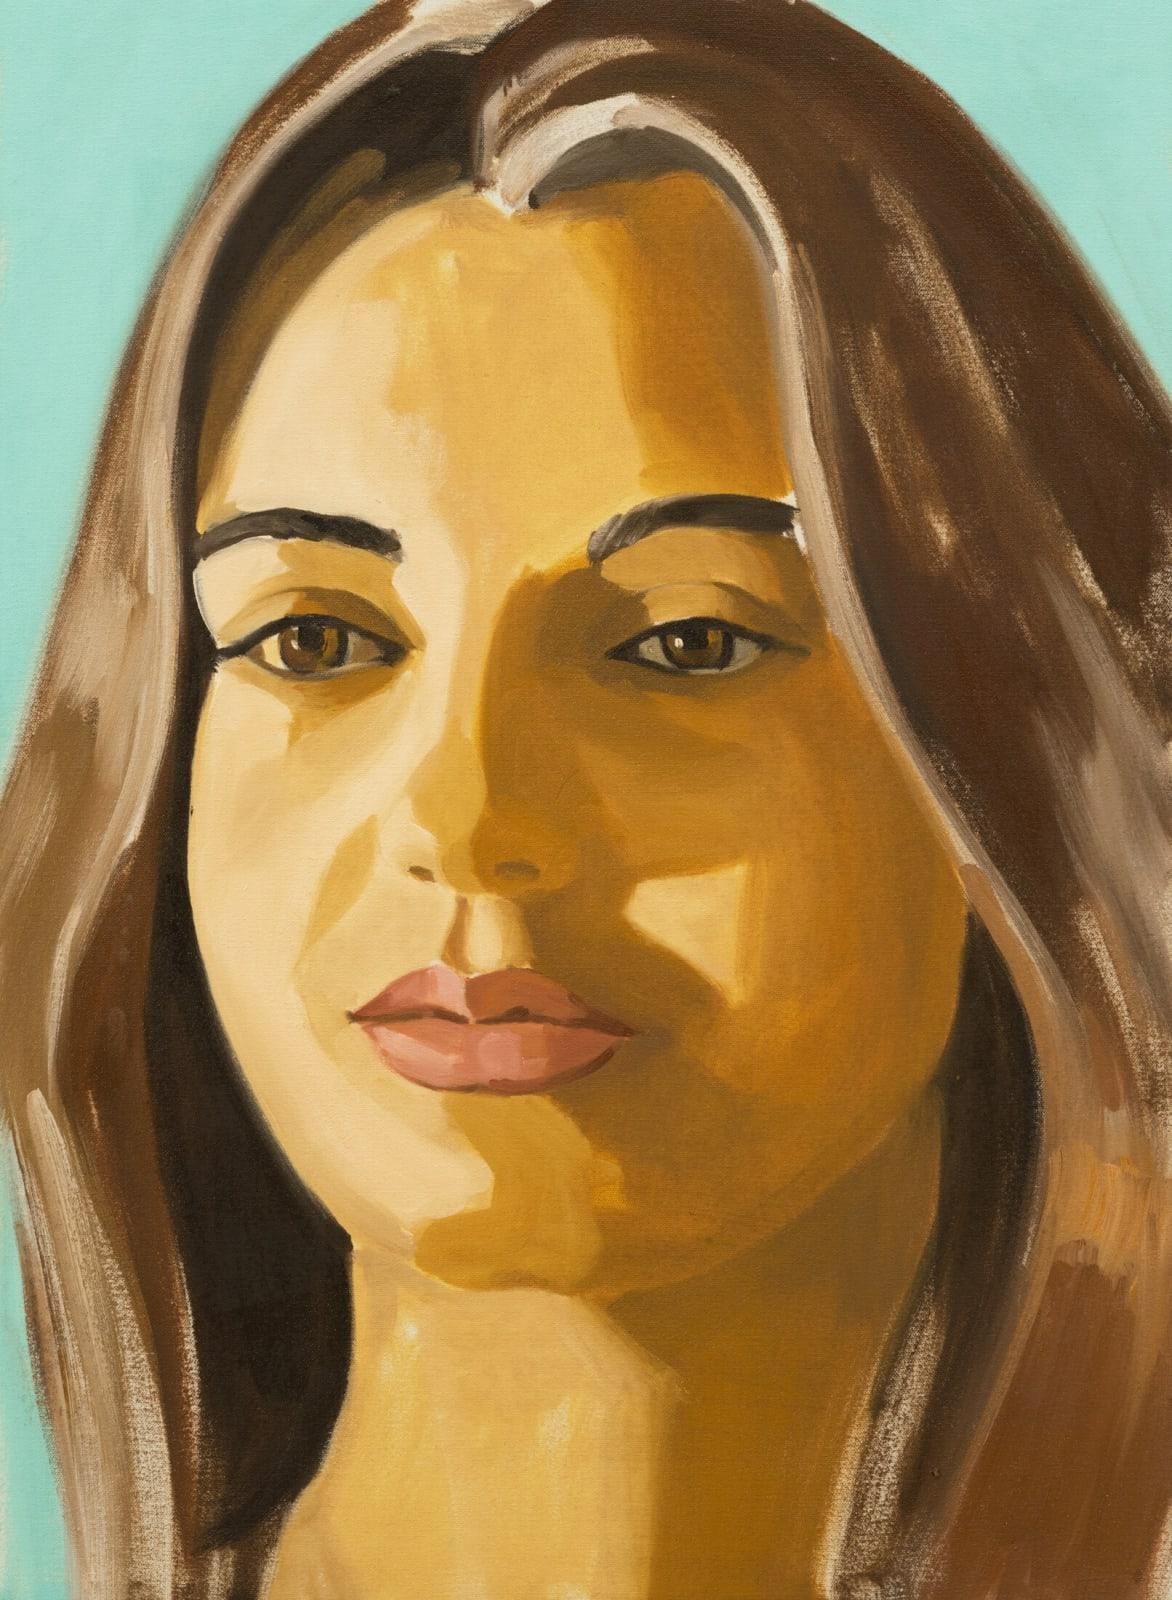 David Salle Untitled (portrait 01) 2019 oil on linen 30 x 22 inches 76.2 x 55.9 cm